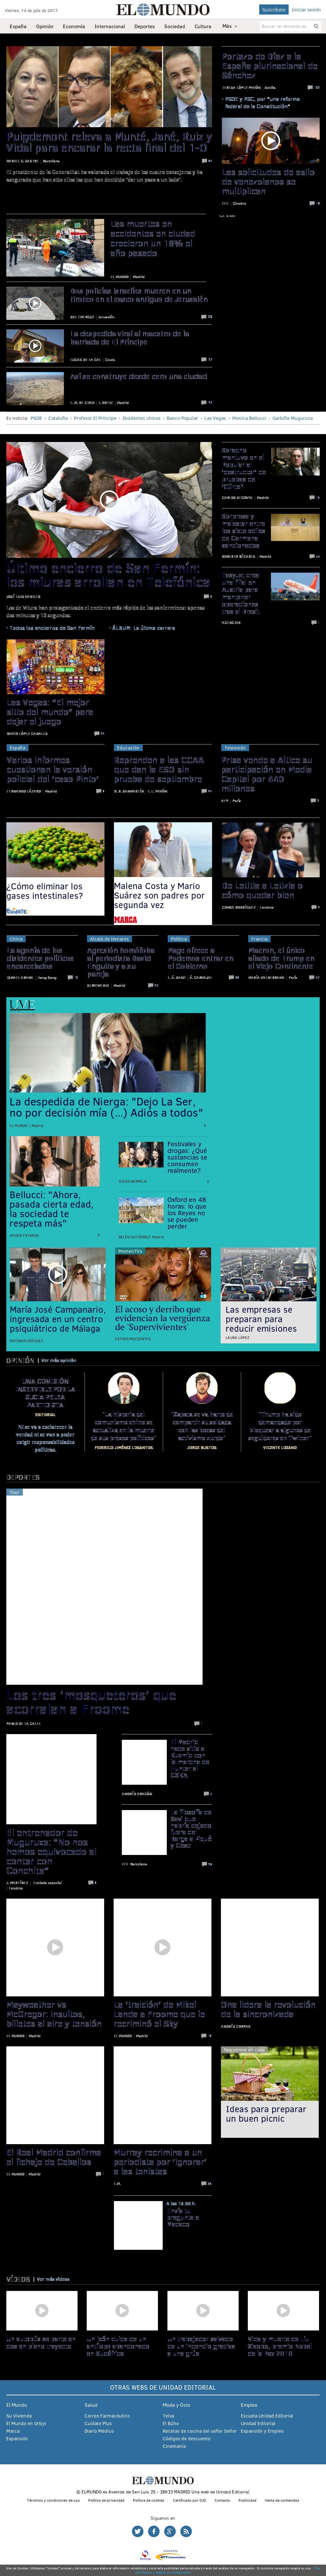 El Mundo at Friday July 14, 2017, 10:12 a.m. UTC